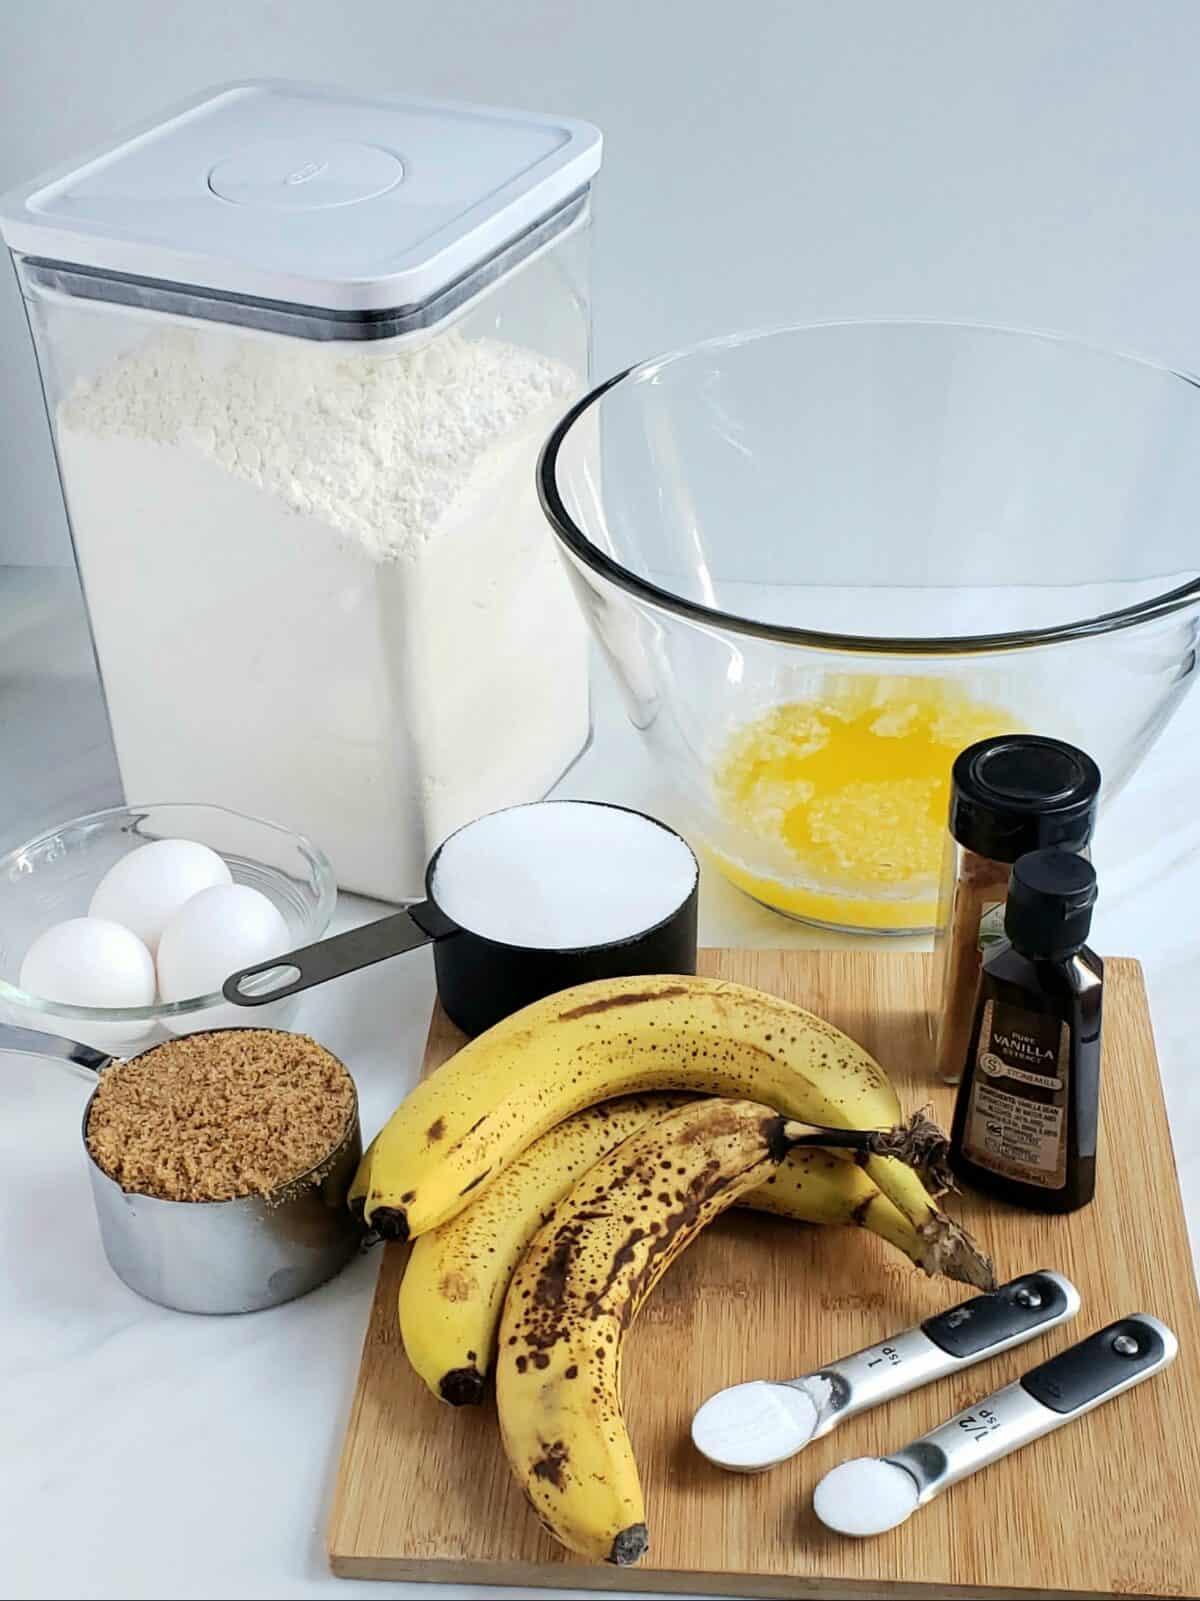 ingredients: flour, brown sugar, eggs, bananas, vanilla butter in a bowl